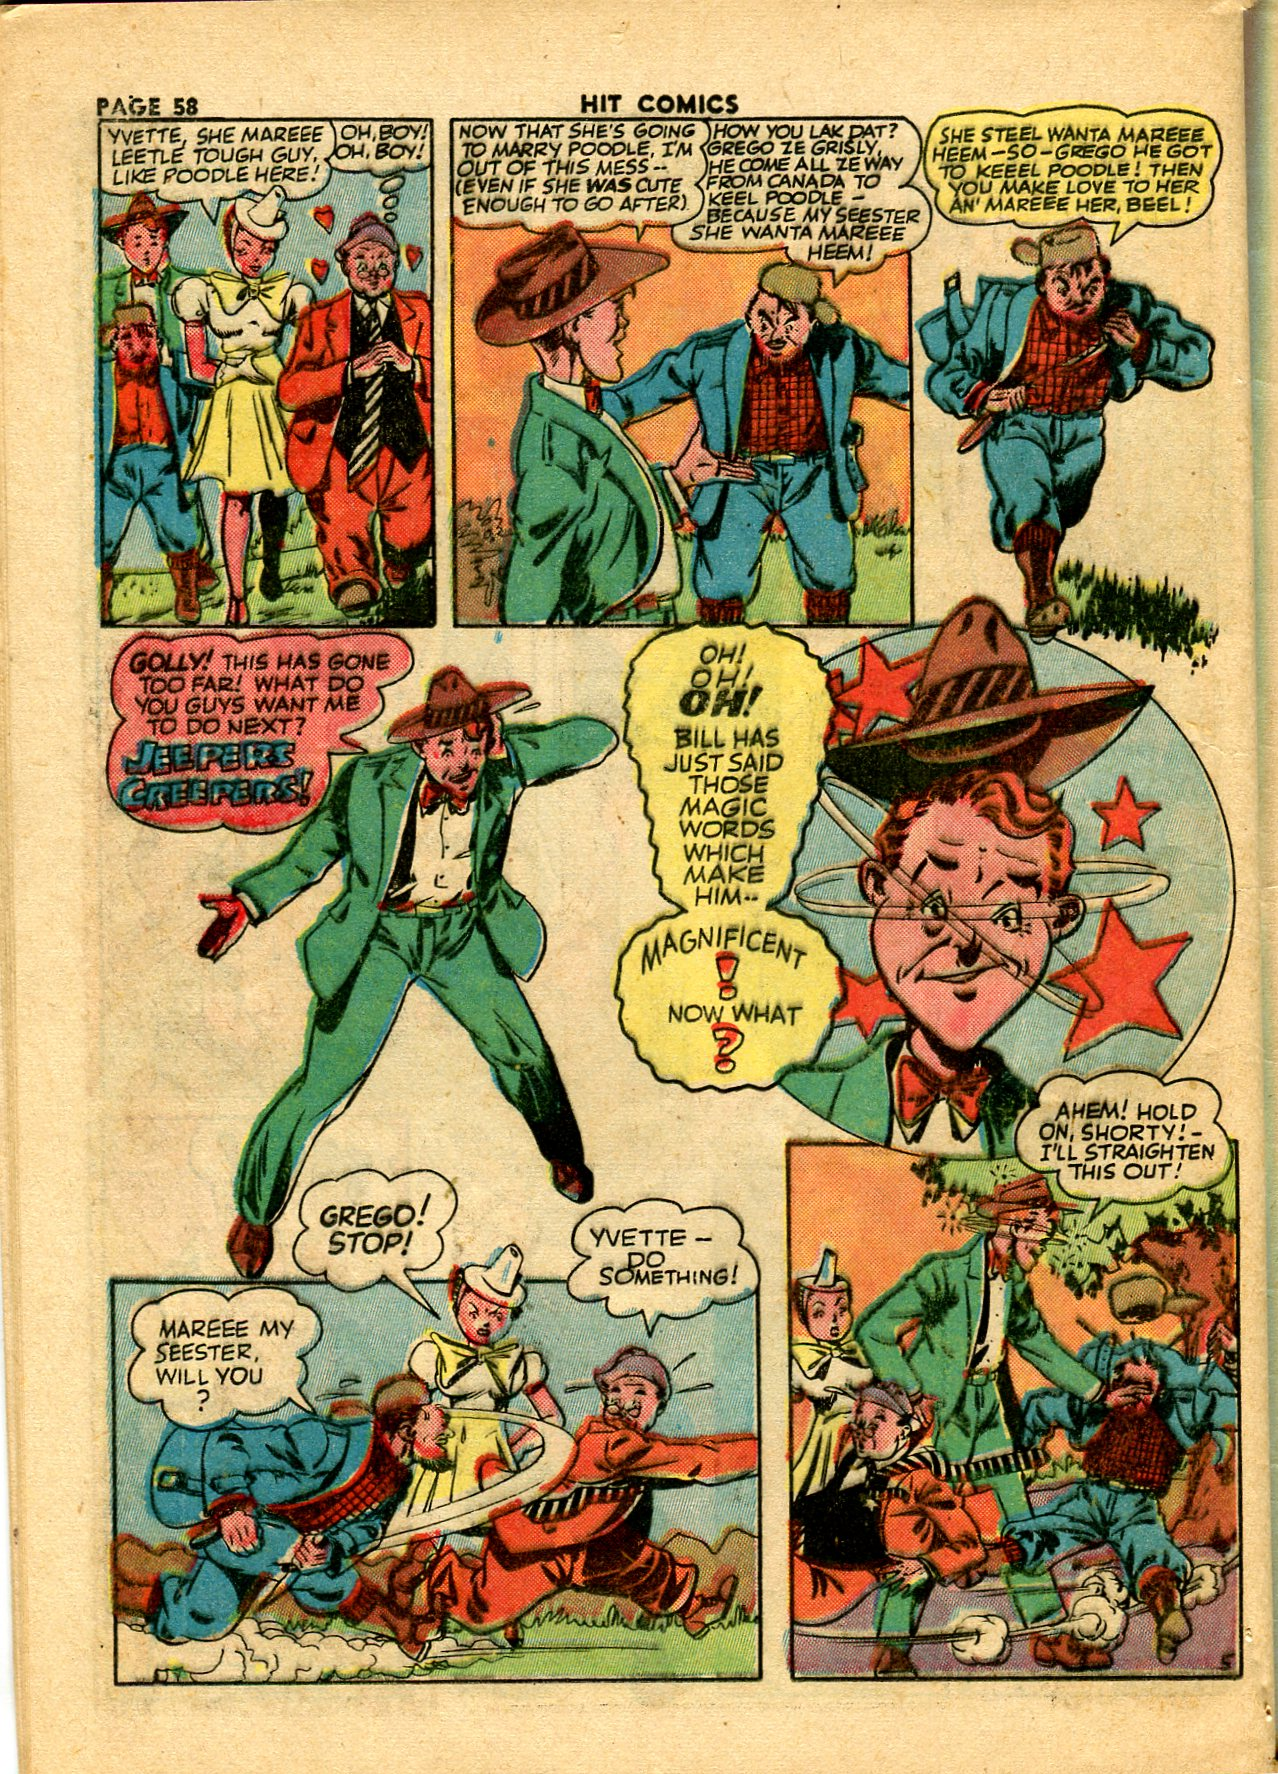 Read online Hit Comics comic -  Issue #28 - 61